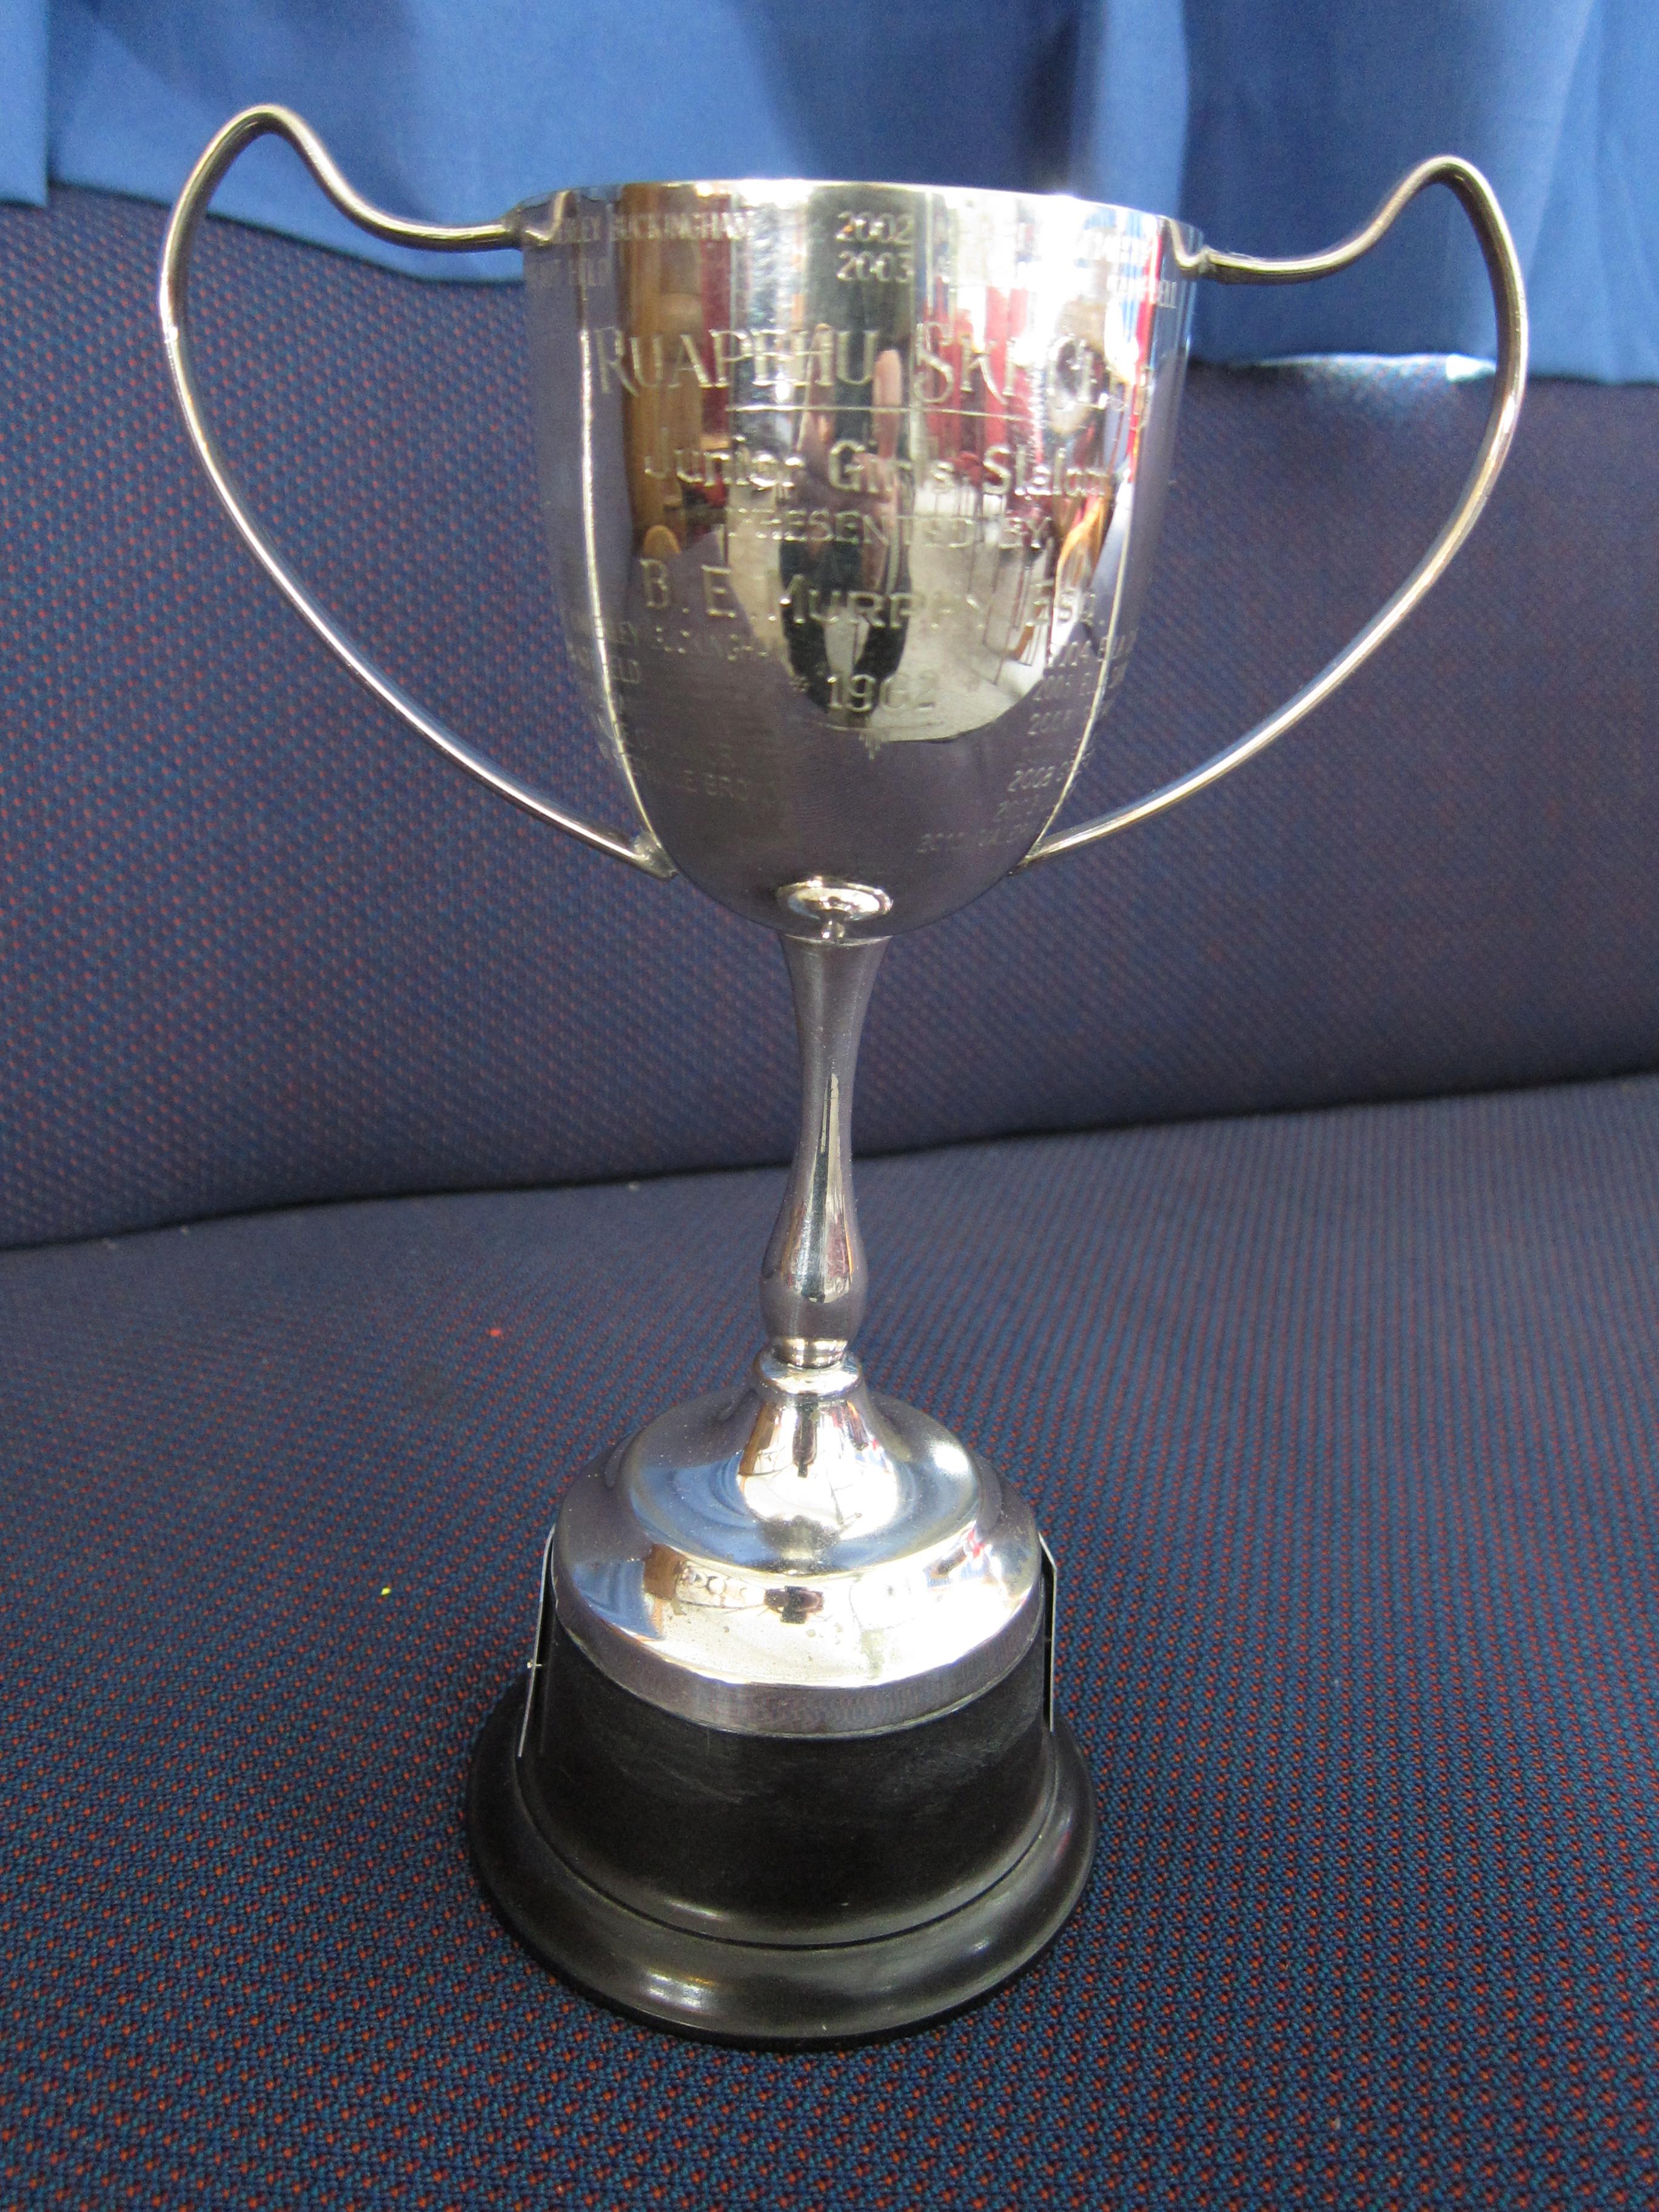 Murphy_Cup.JPG